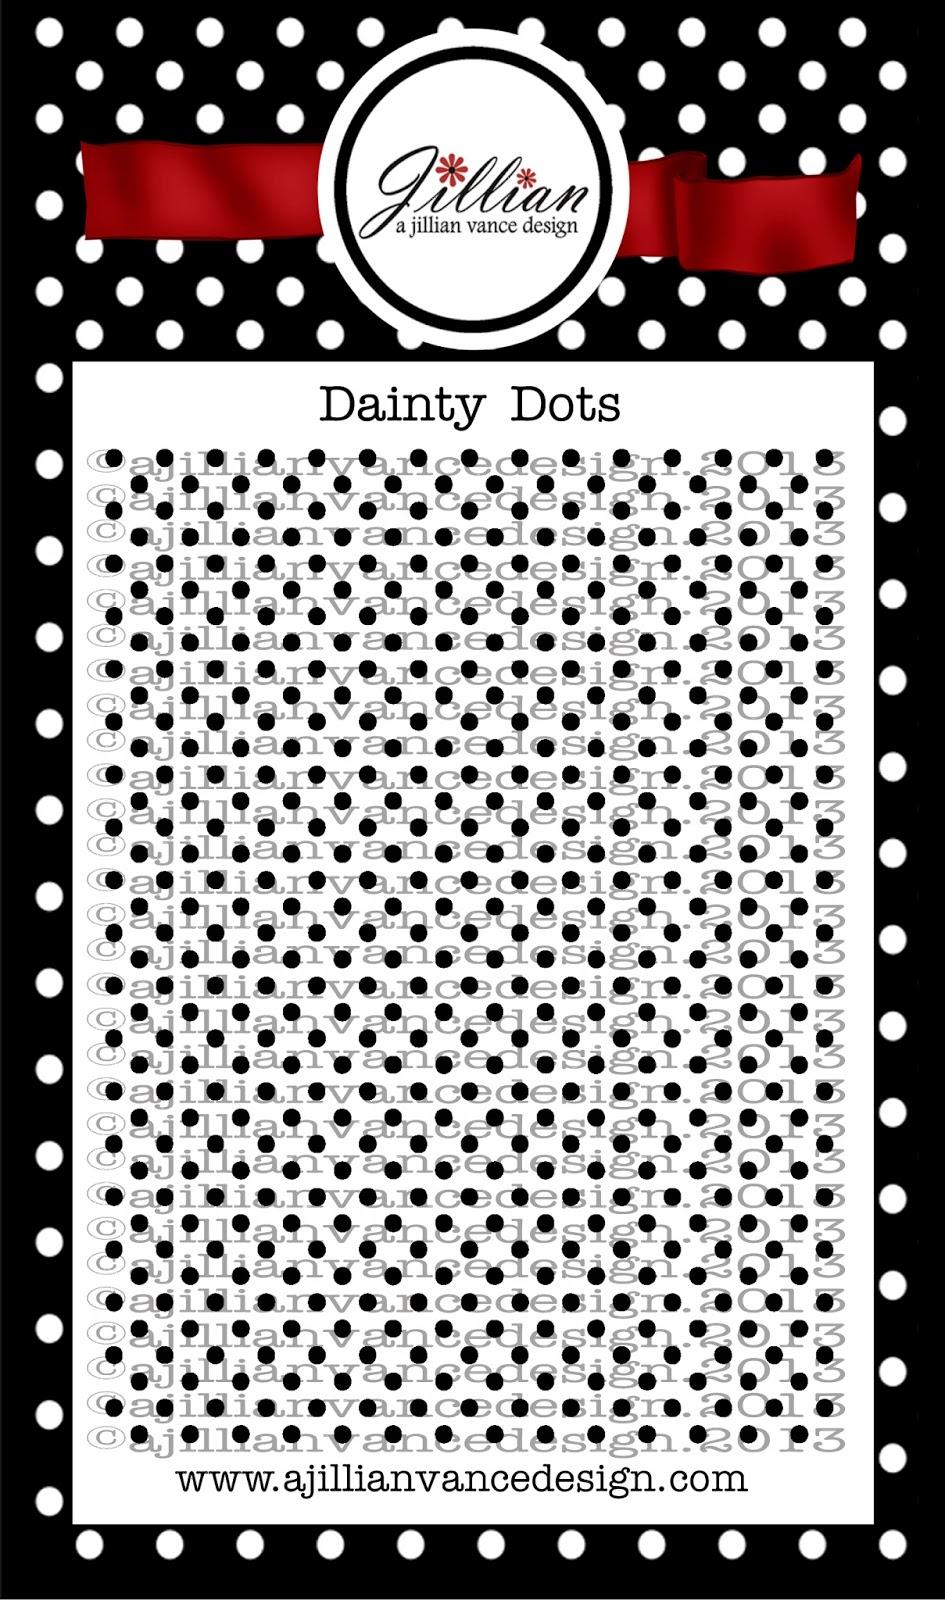 Dainty Dots